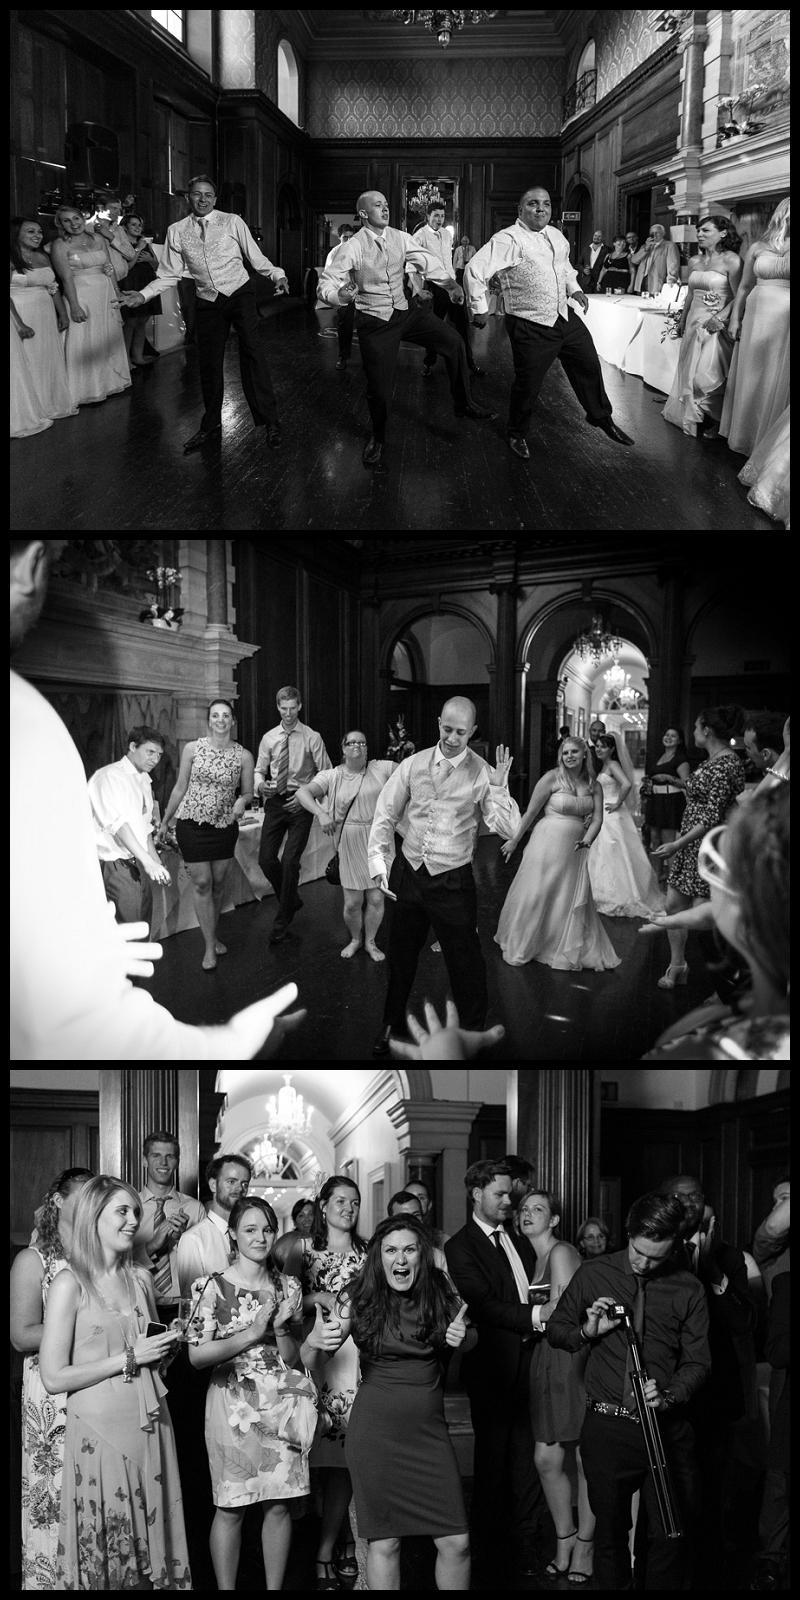 The lads dancing.jpg